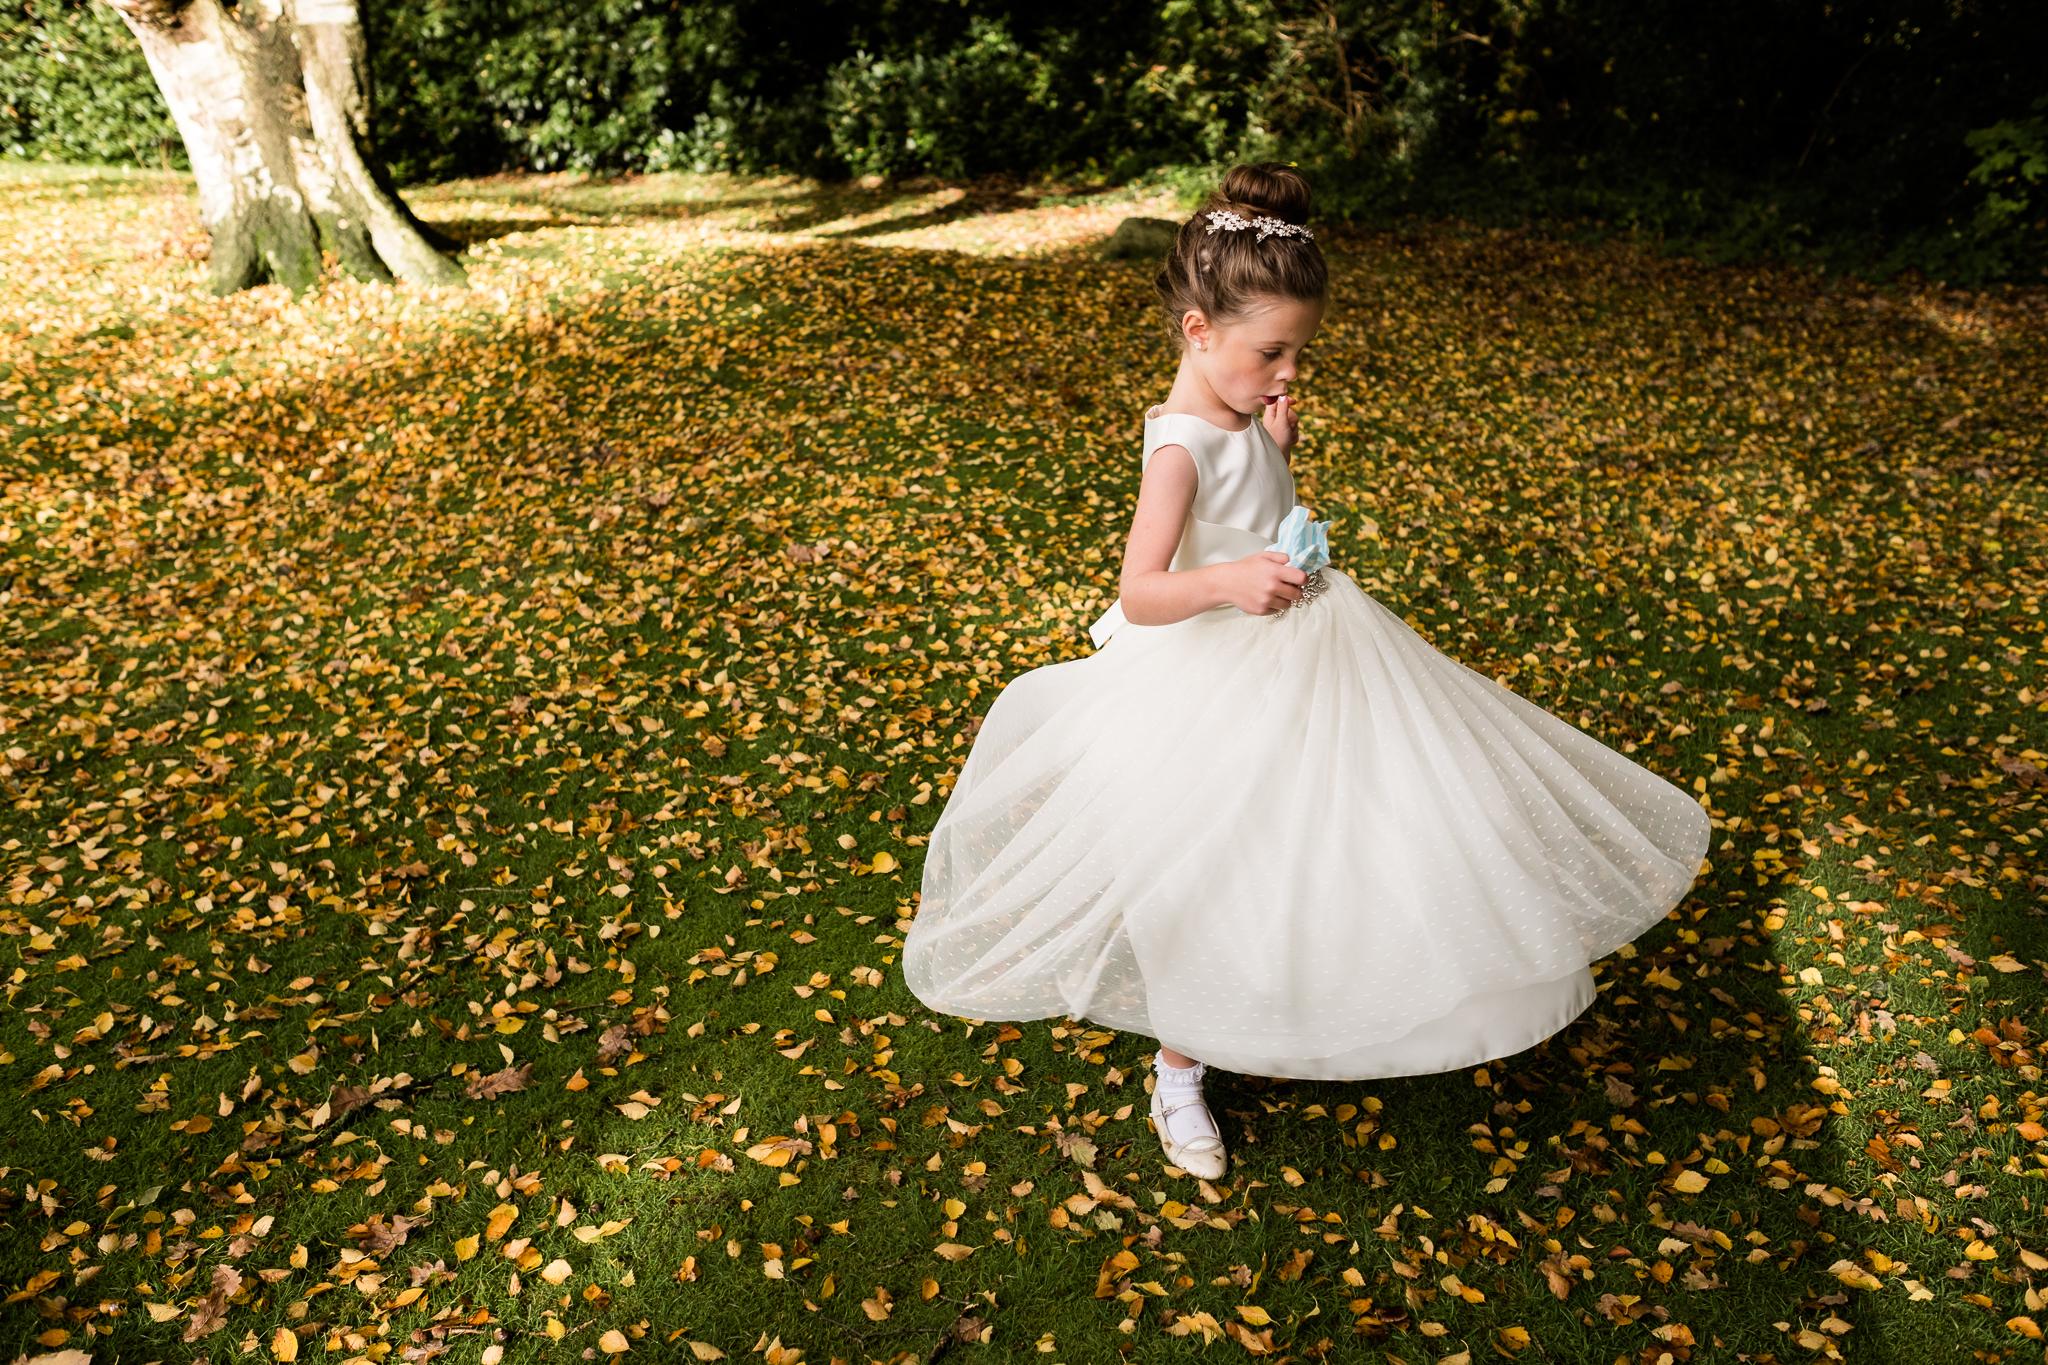 Autumn Cheshire Wedding Photography at Wincham Hall - Jenny Harper-9.jpg